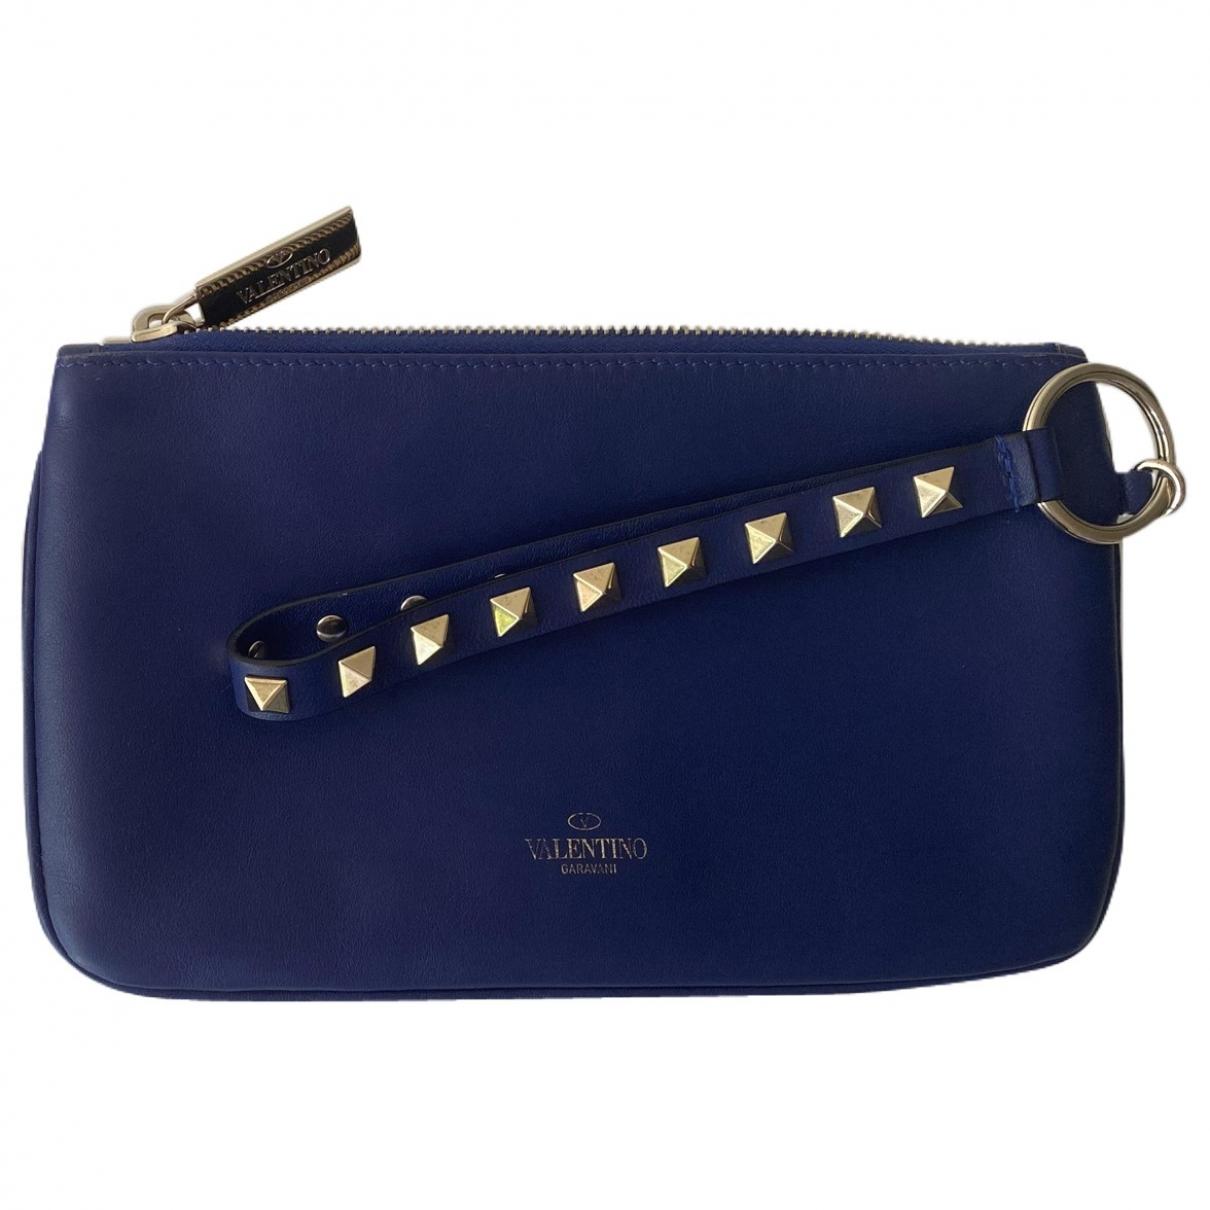 Valentino Garavani Rockstud Blue Leather Clutch bag for Women \N